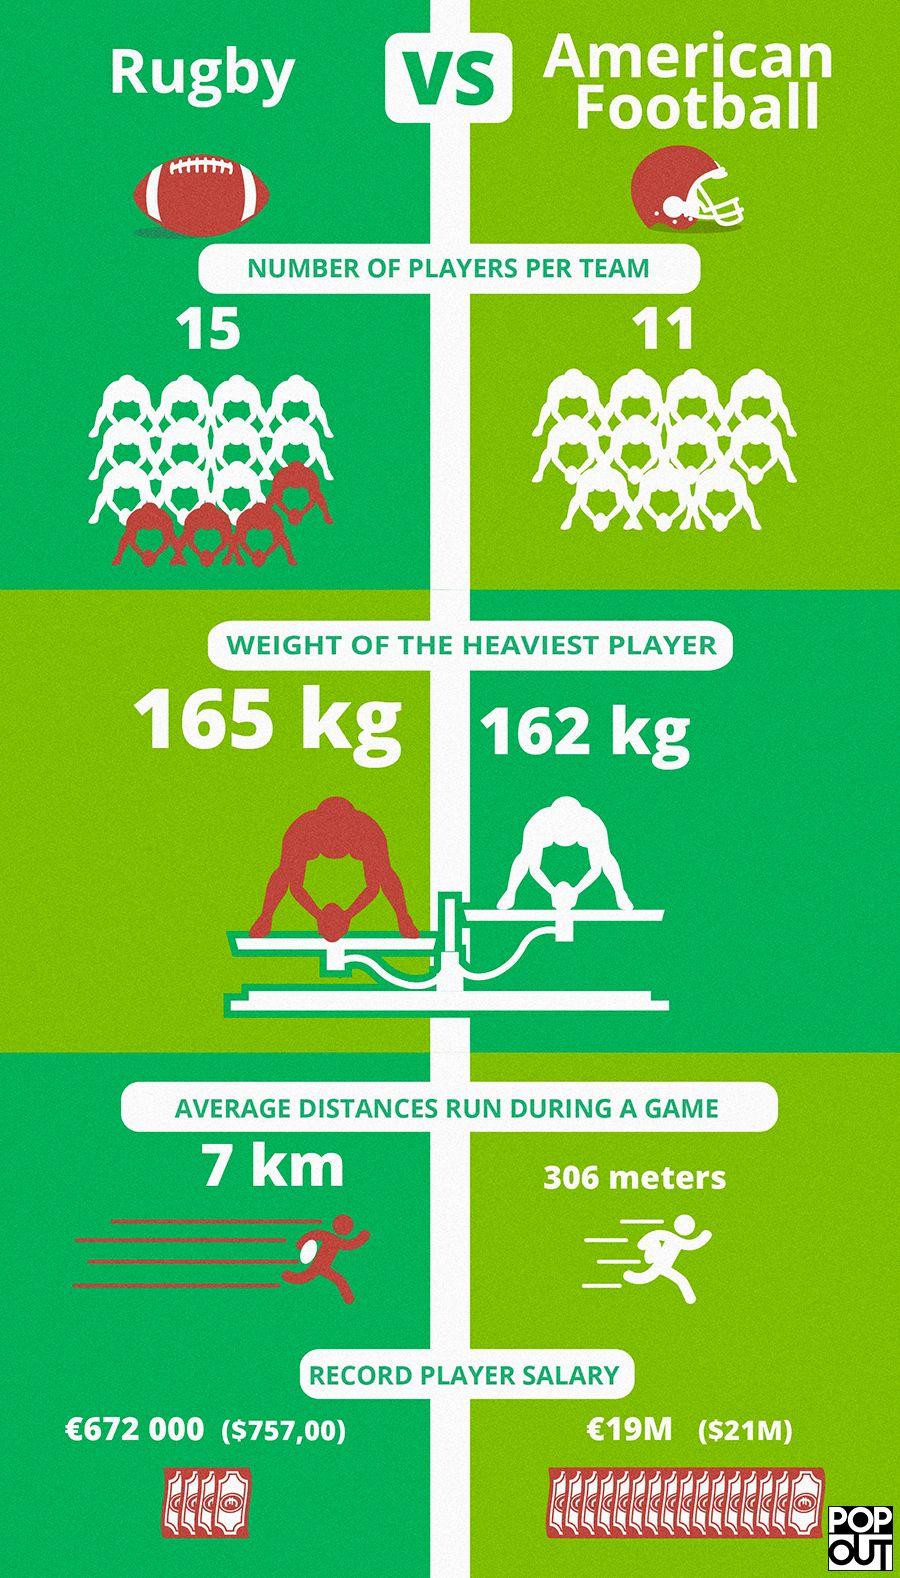 Rugby Vs American Football Crunching The Numbers Popout Rugby Vs American Football Rugby Sport Rugby Vs Football